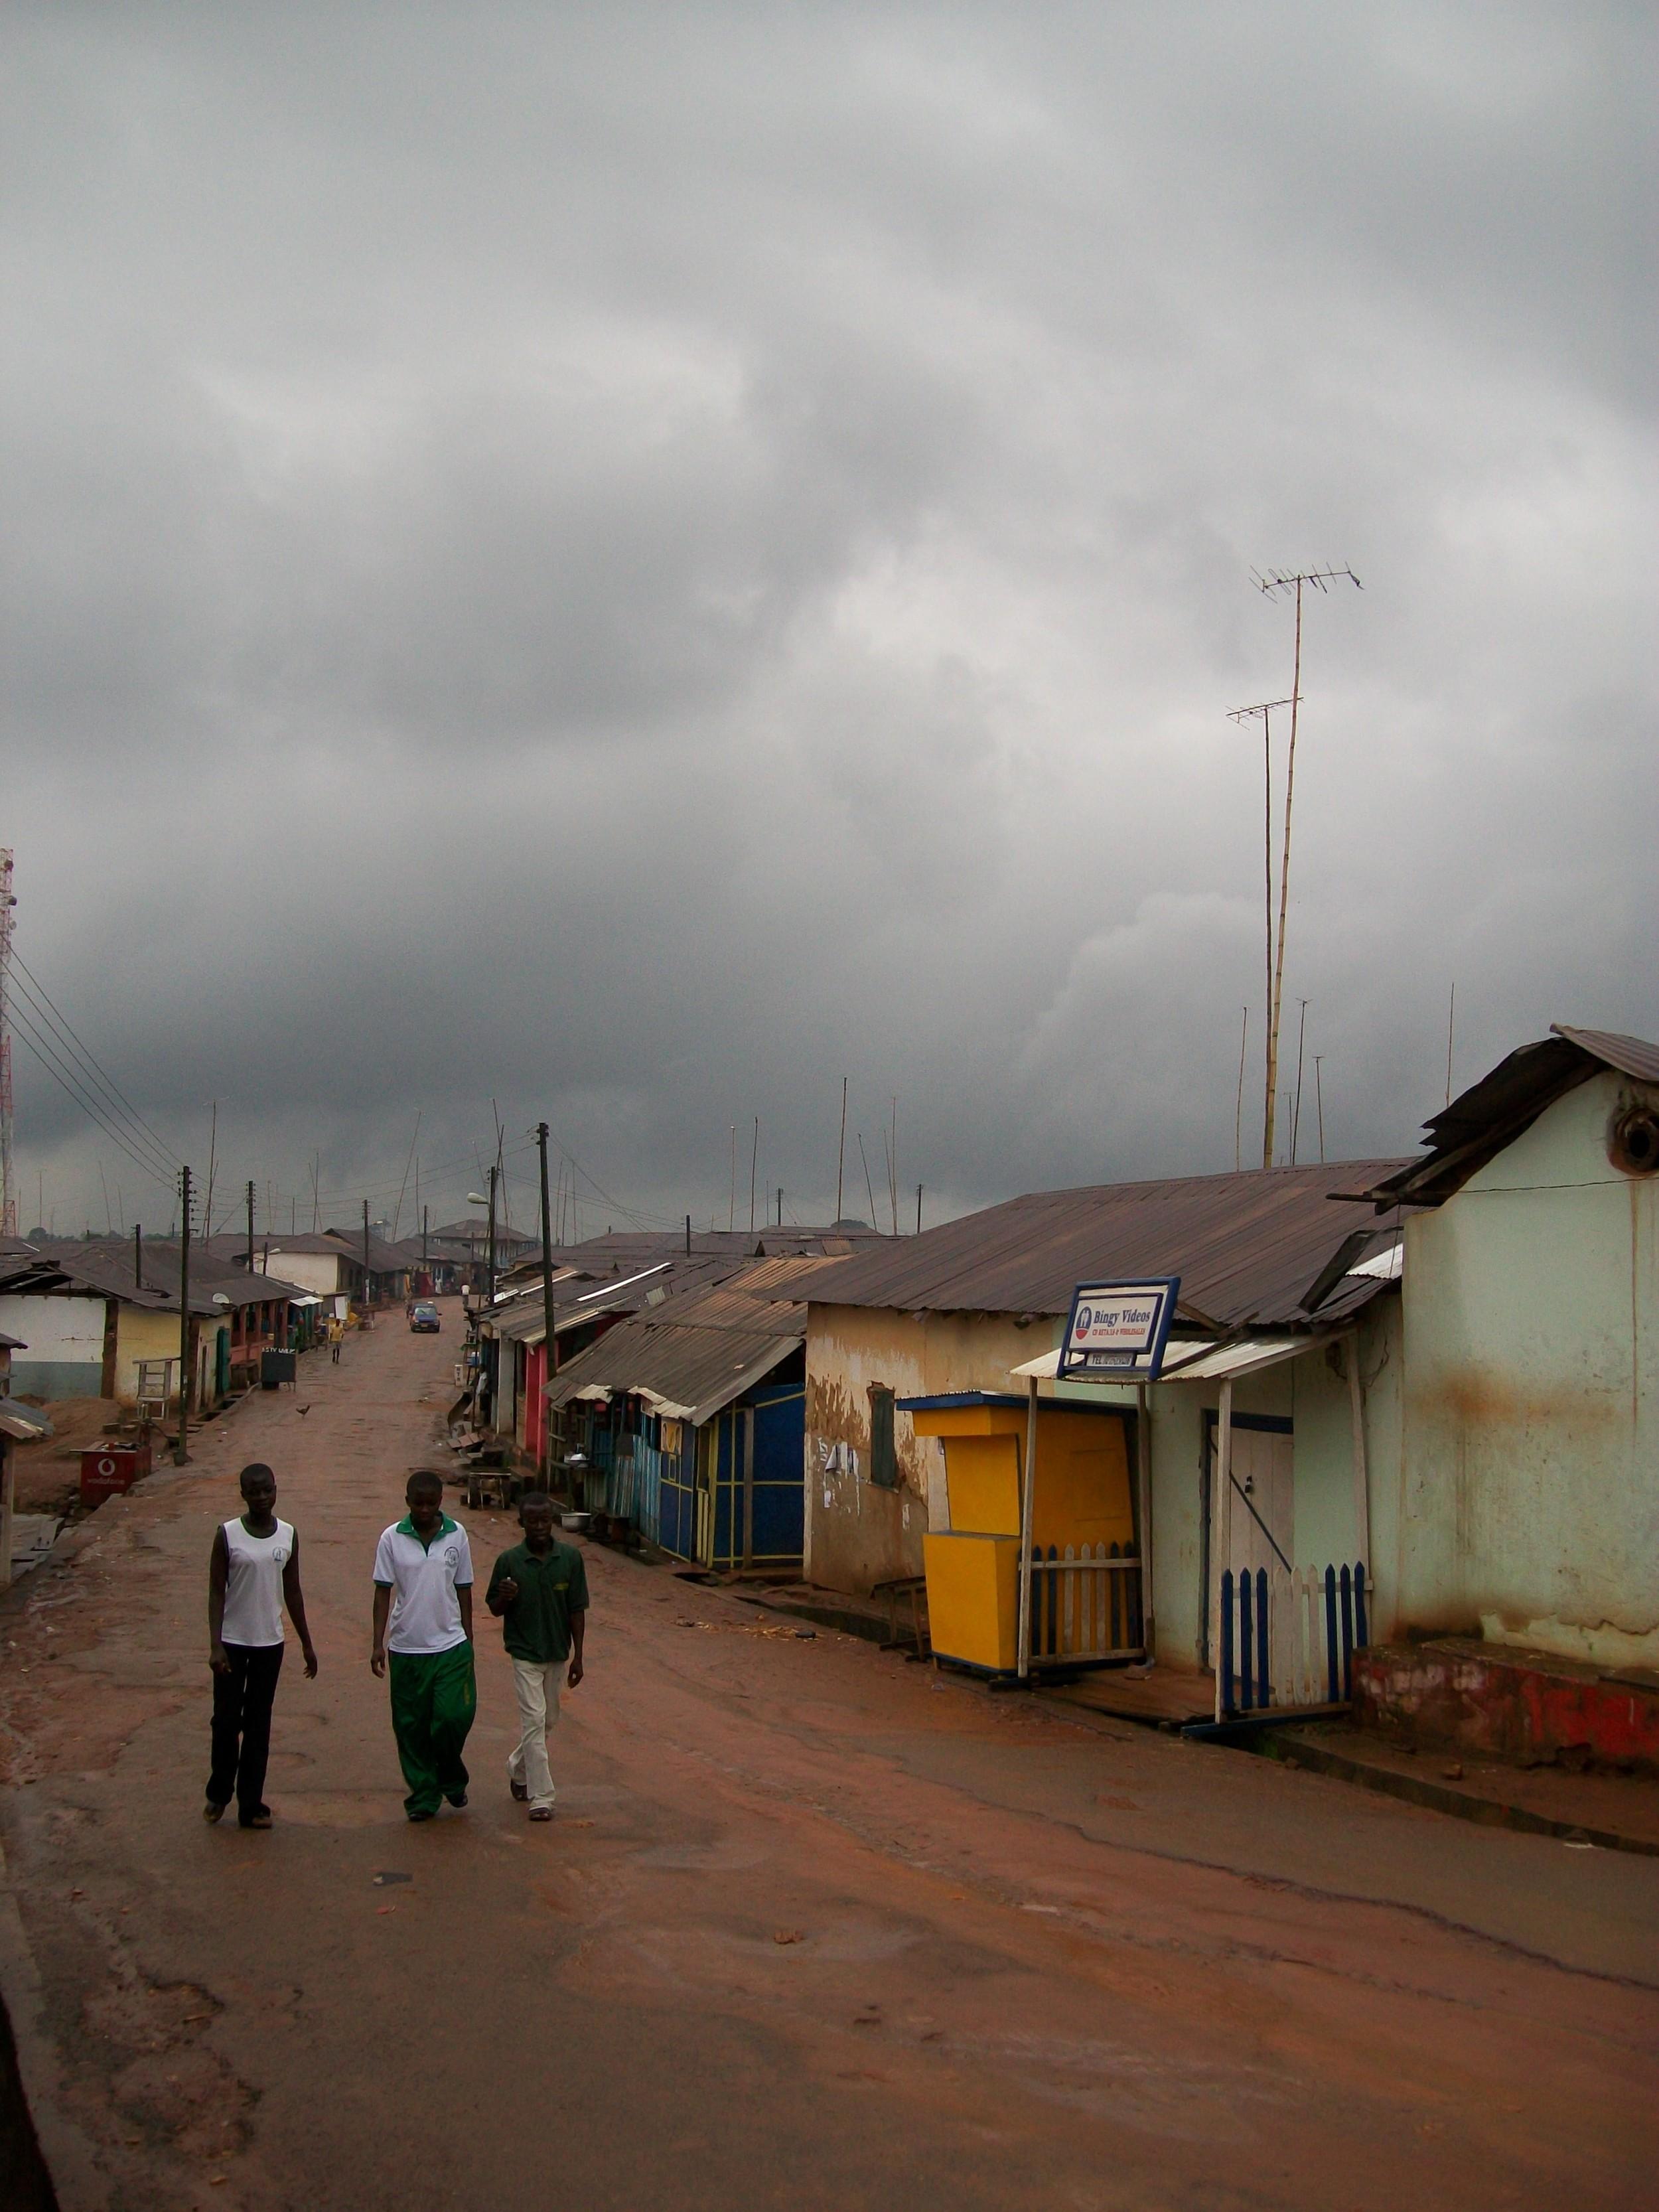 A street scene in rural Central Region, Ghana, before a rainstorm, 2010.  Photo by M. Sophia Newman